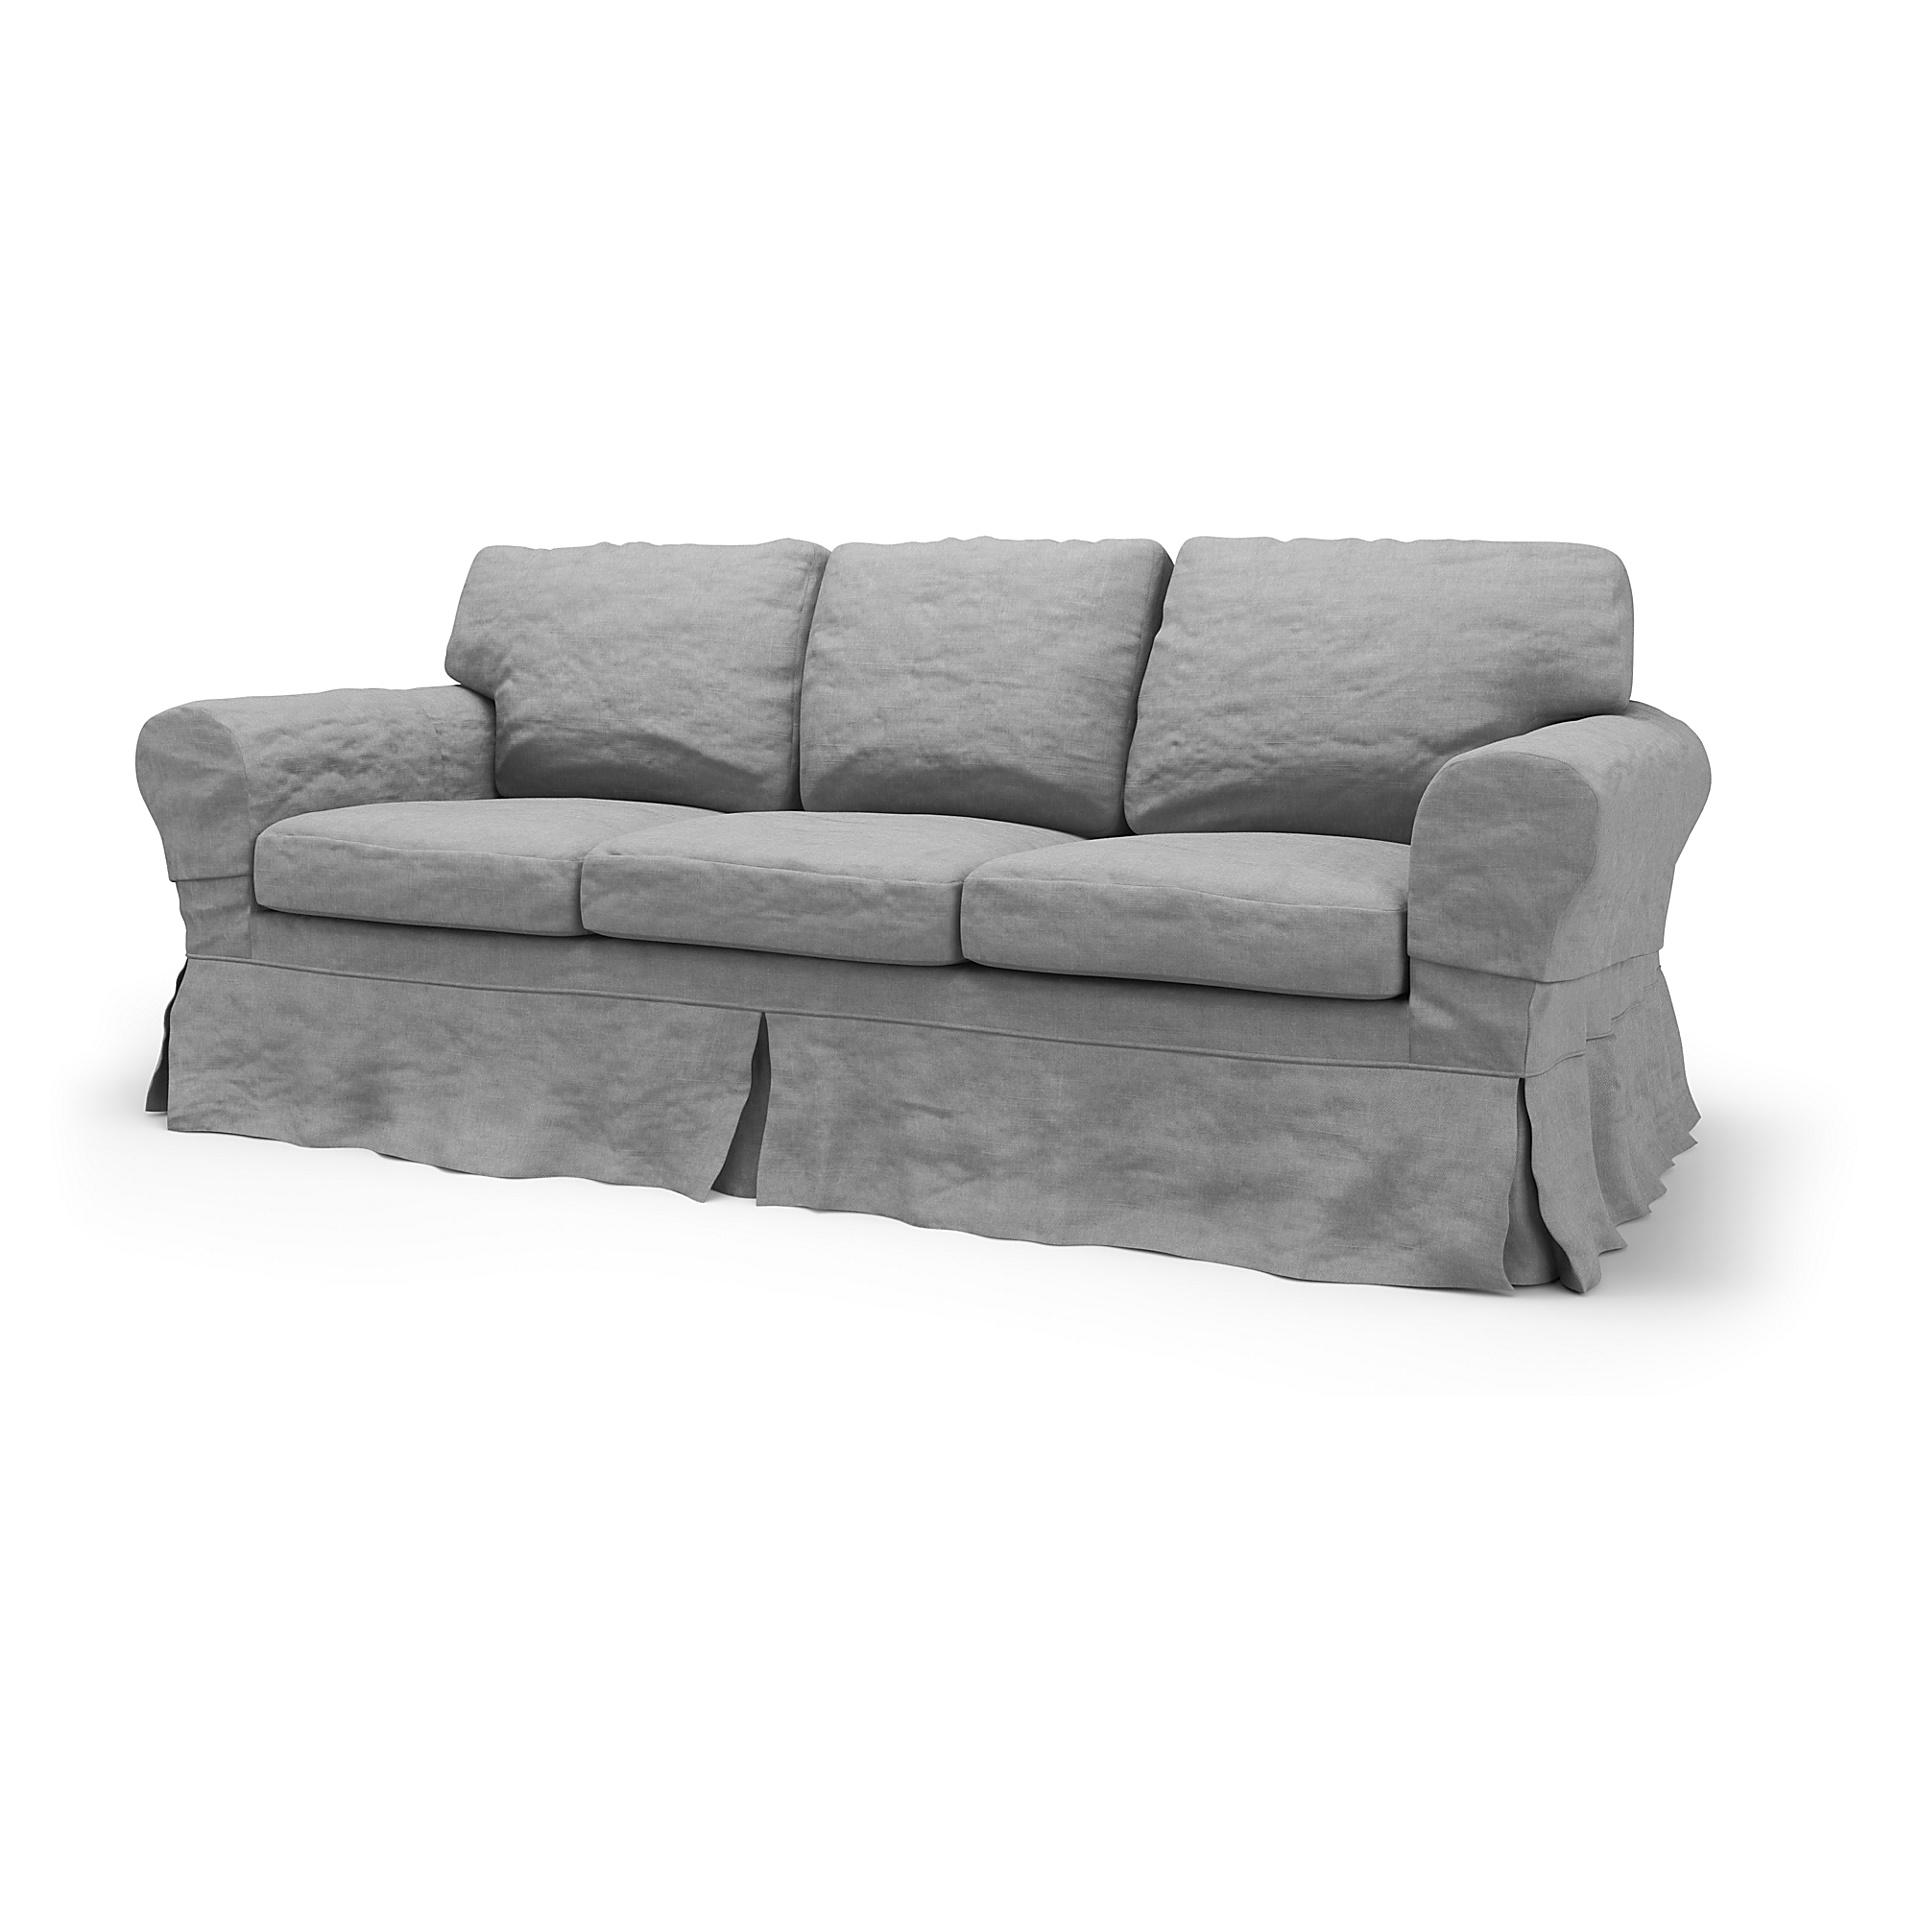 Ikea Ektorp 3 Seater Sofa Bed Cover Loose Fit Bemz